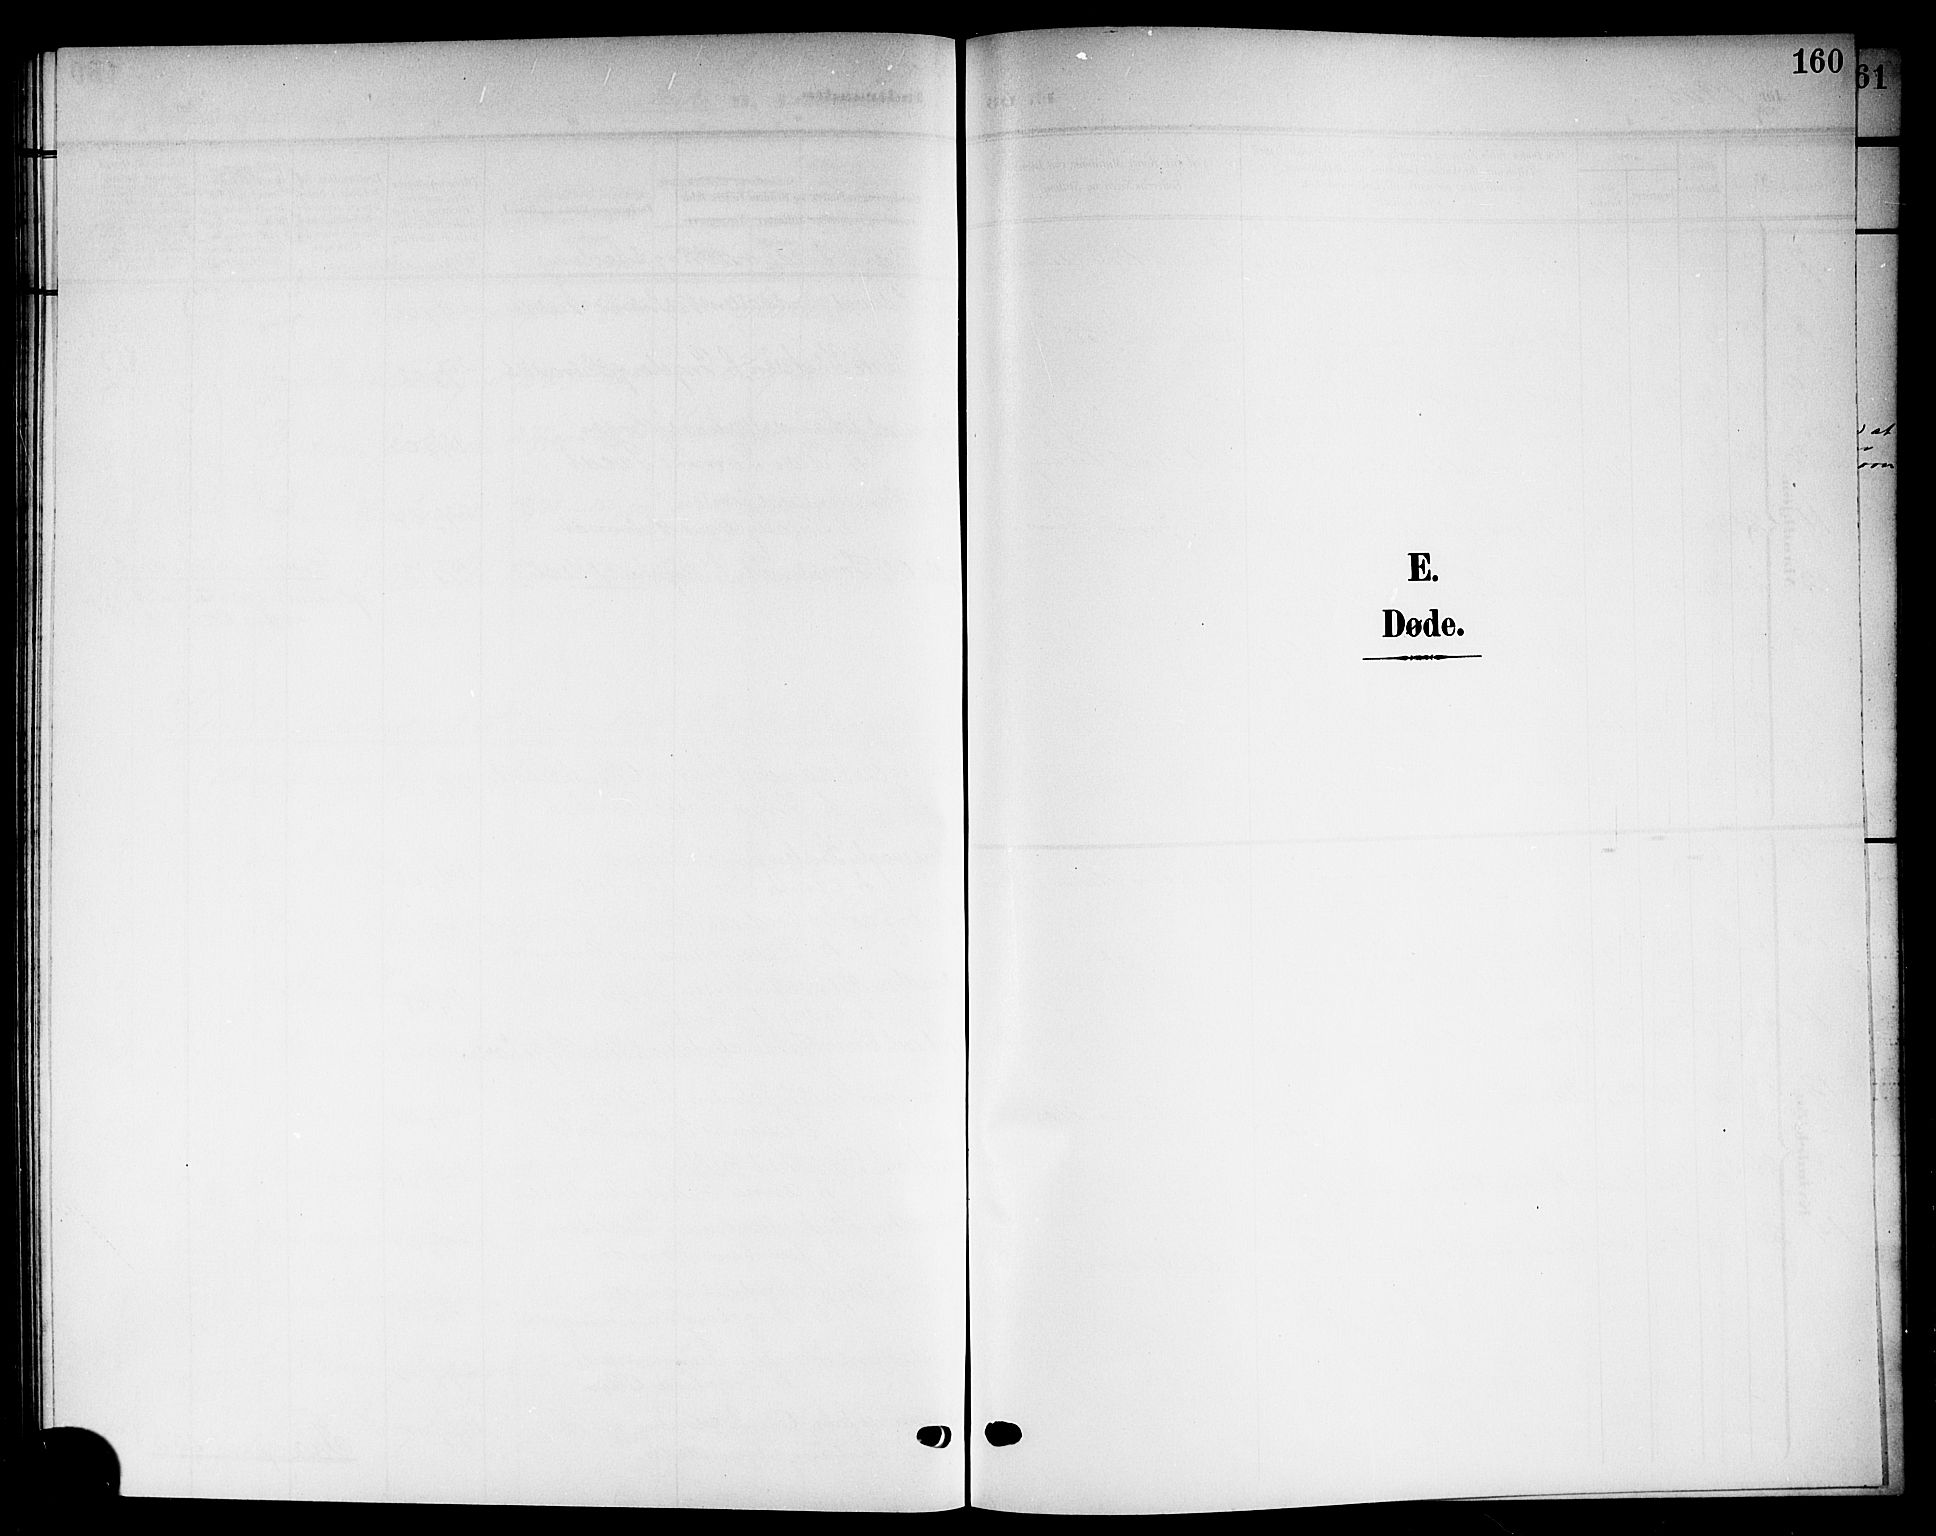 SAKO, Solum kirkebøker, G/Gb/L0005: Klokkerbok nr. II 5, 1905-1914, s. 160